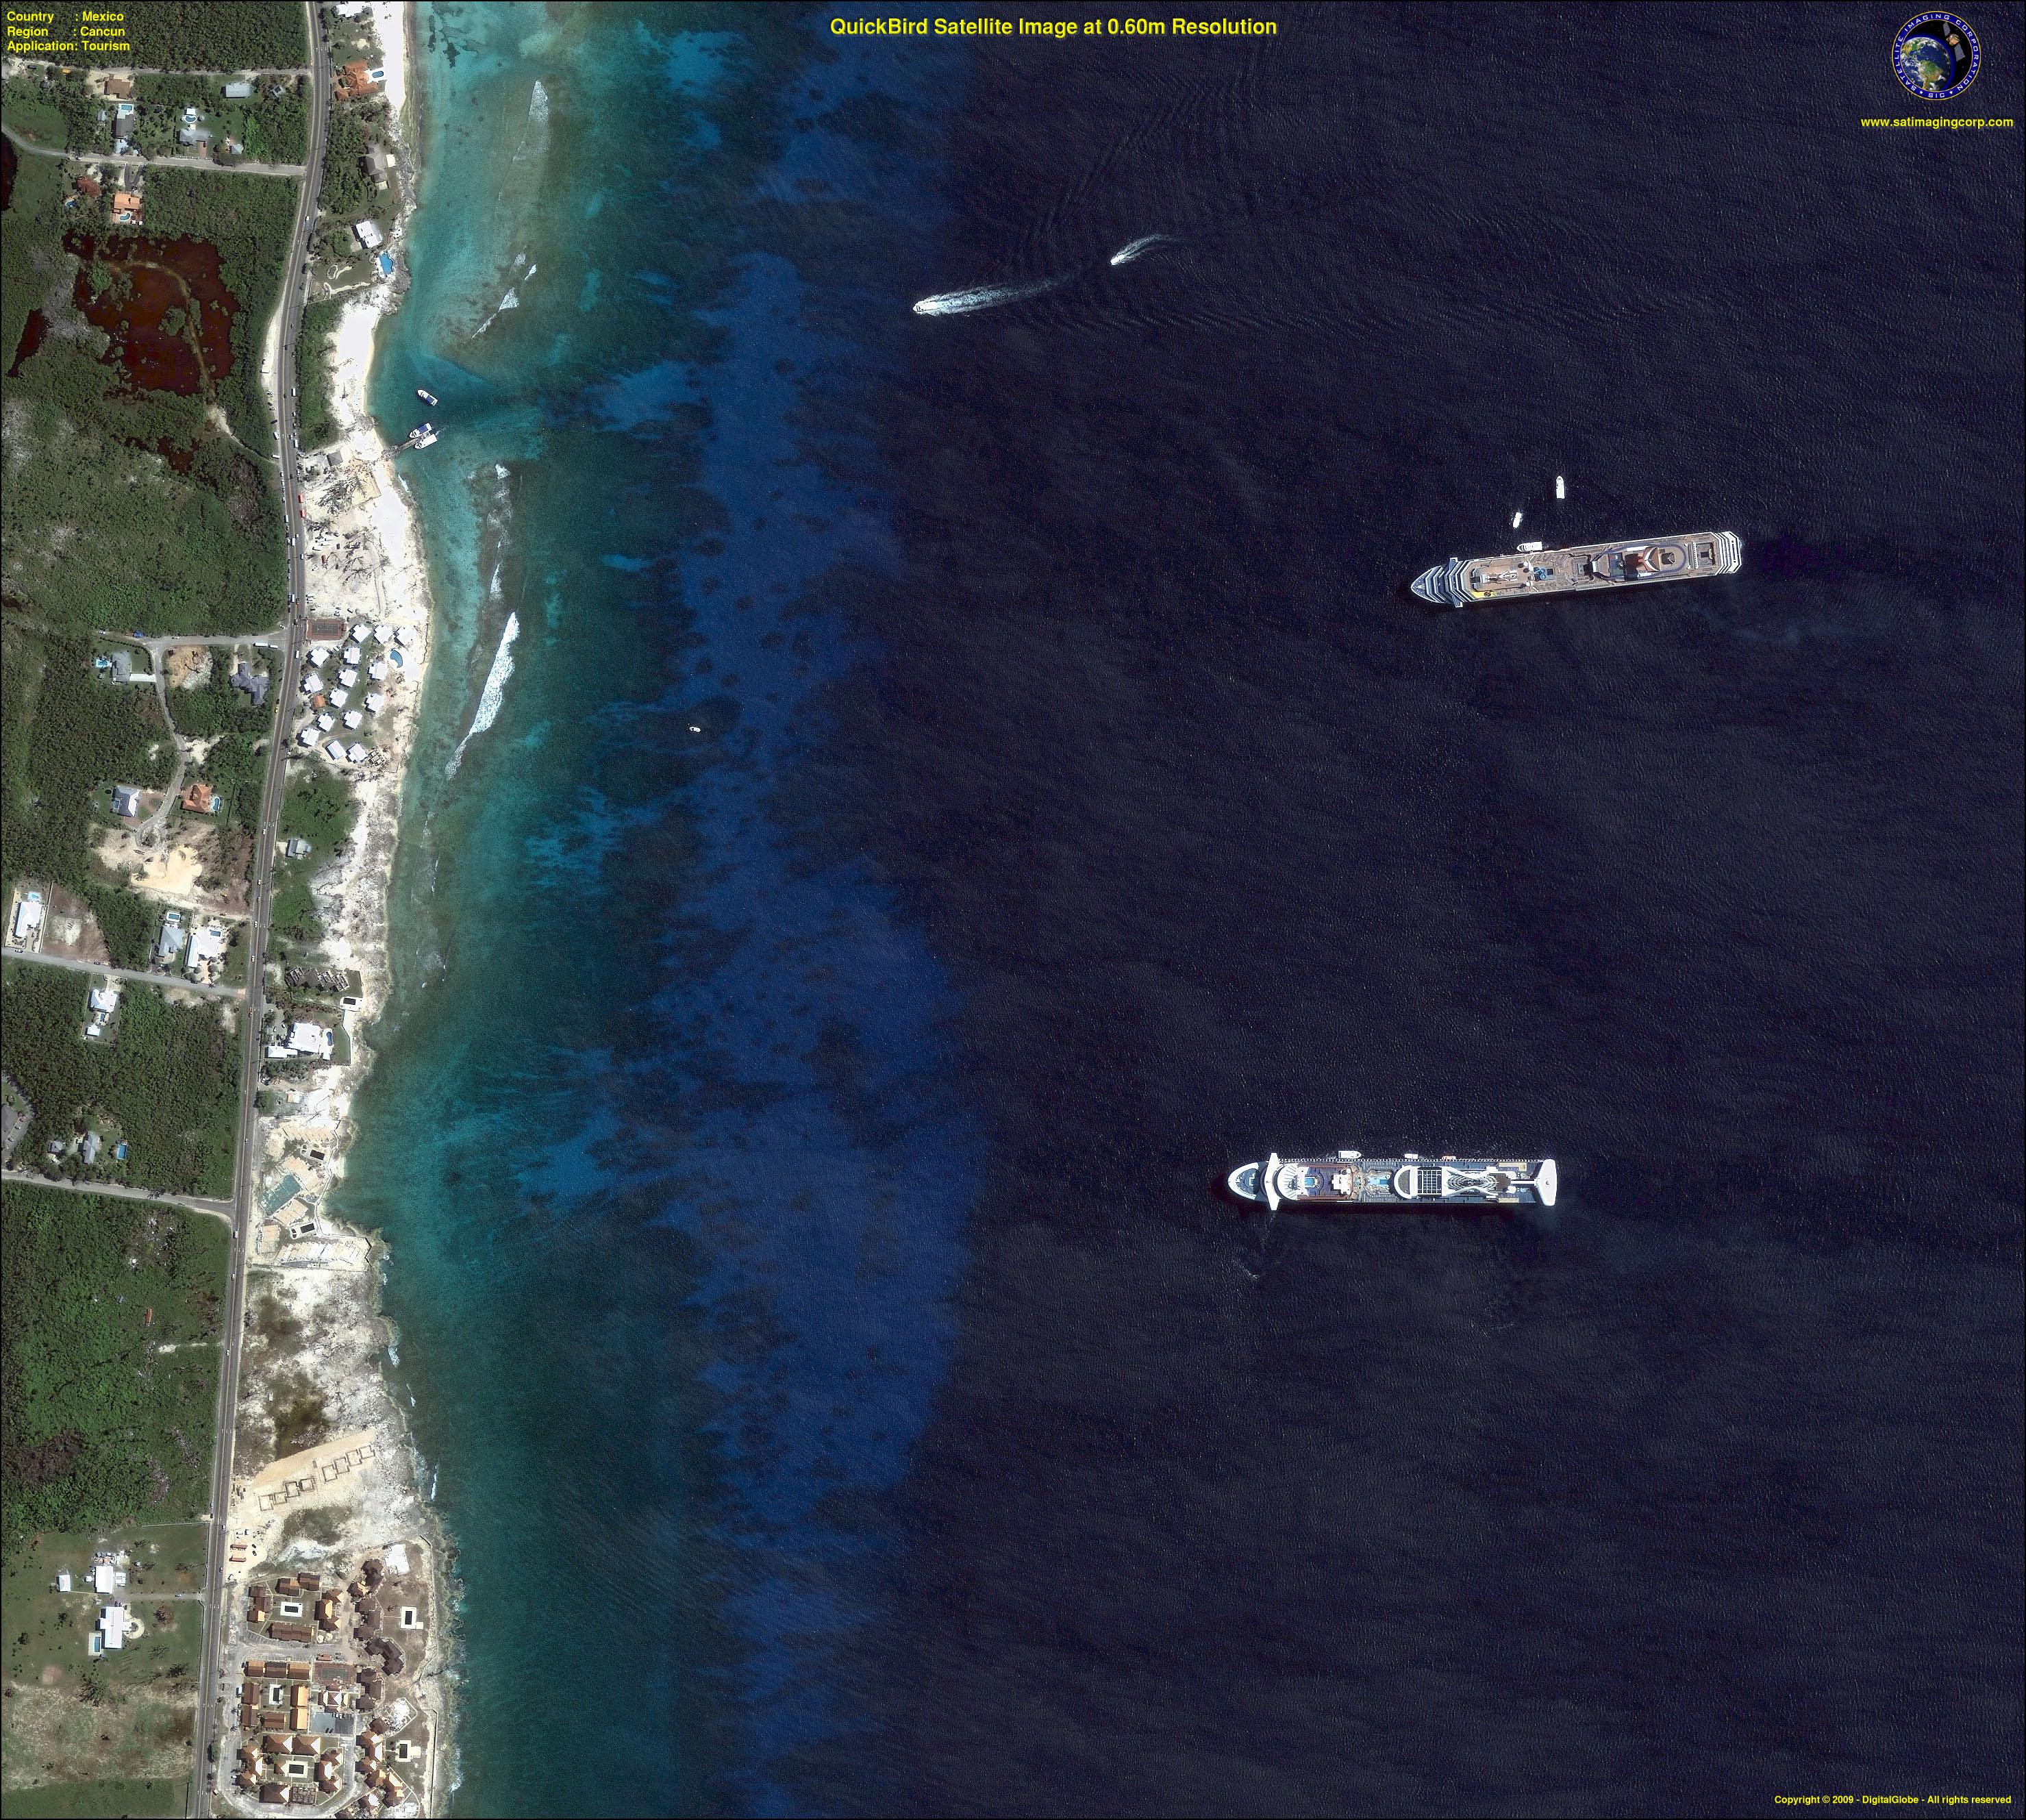 QuickBird Satellite Image of Cancun Mexico Satellite Imaging Corp